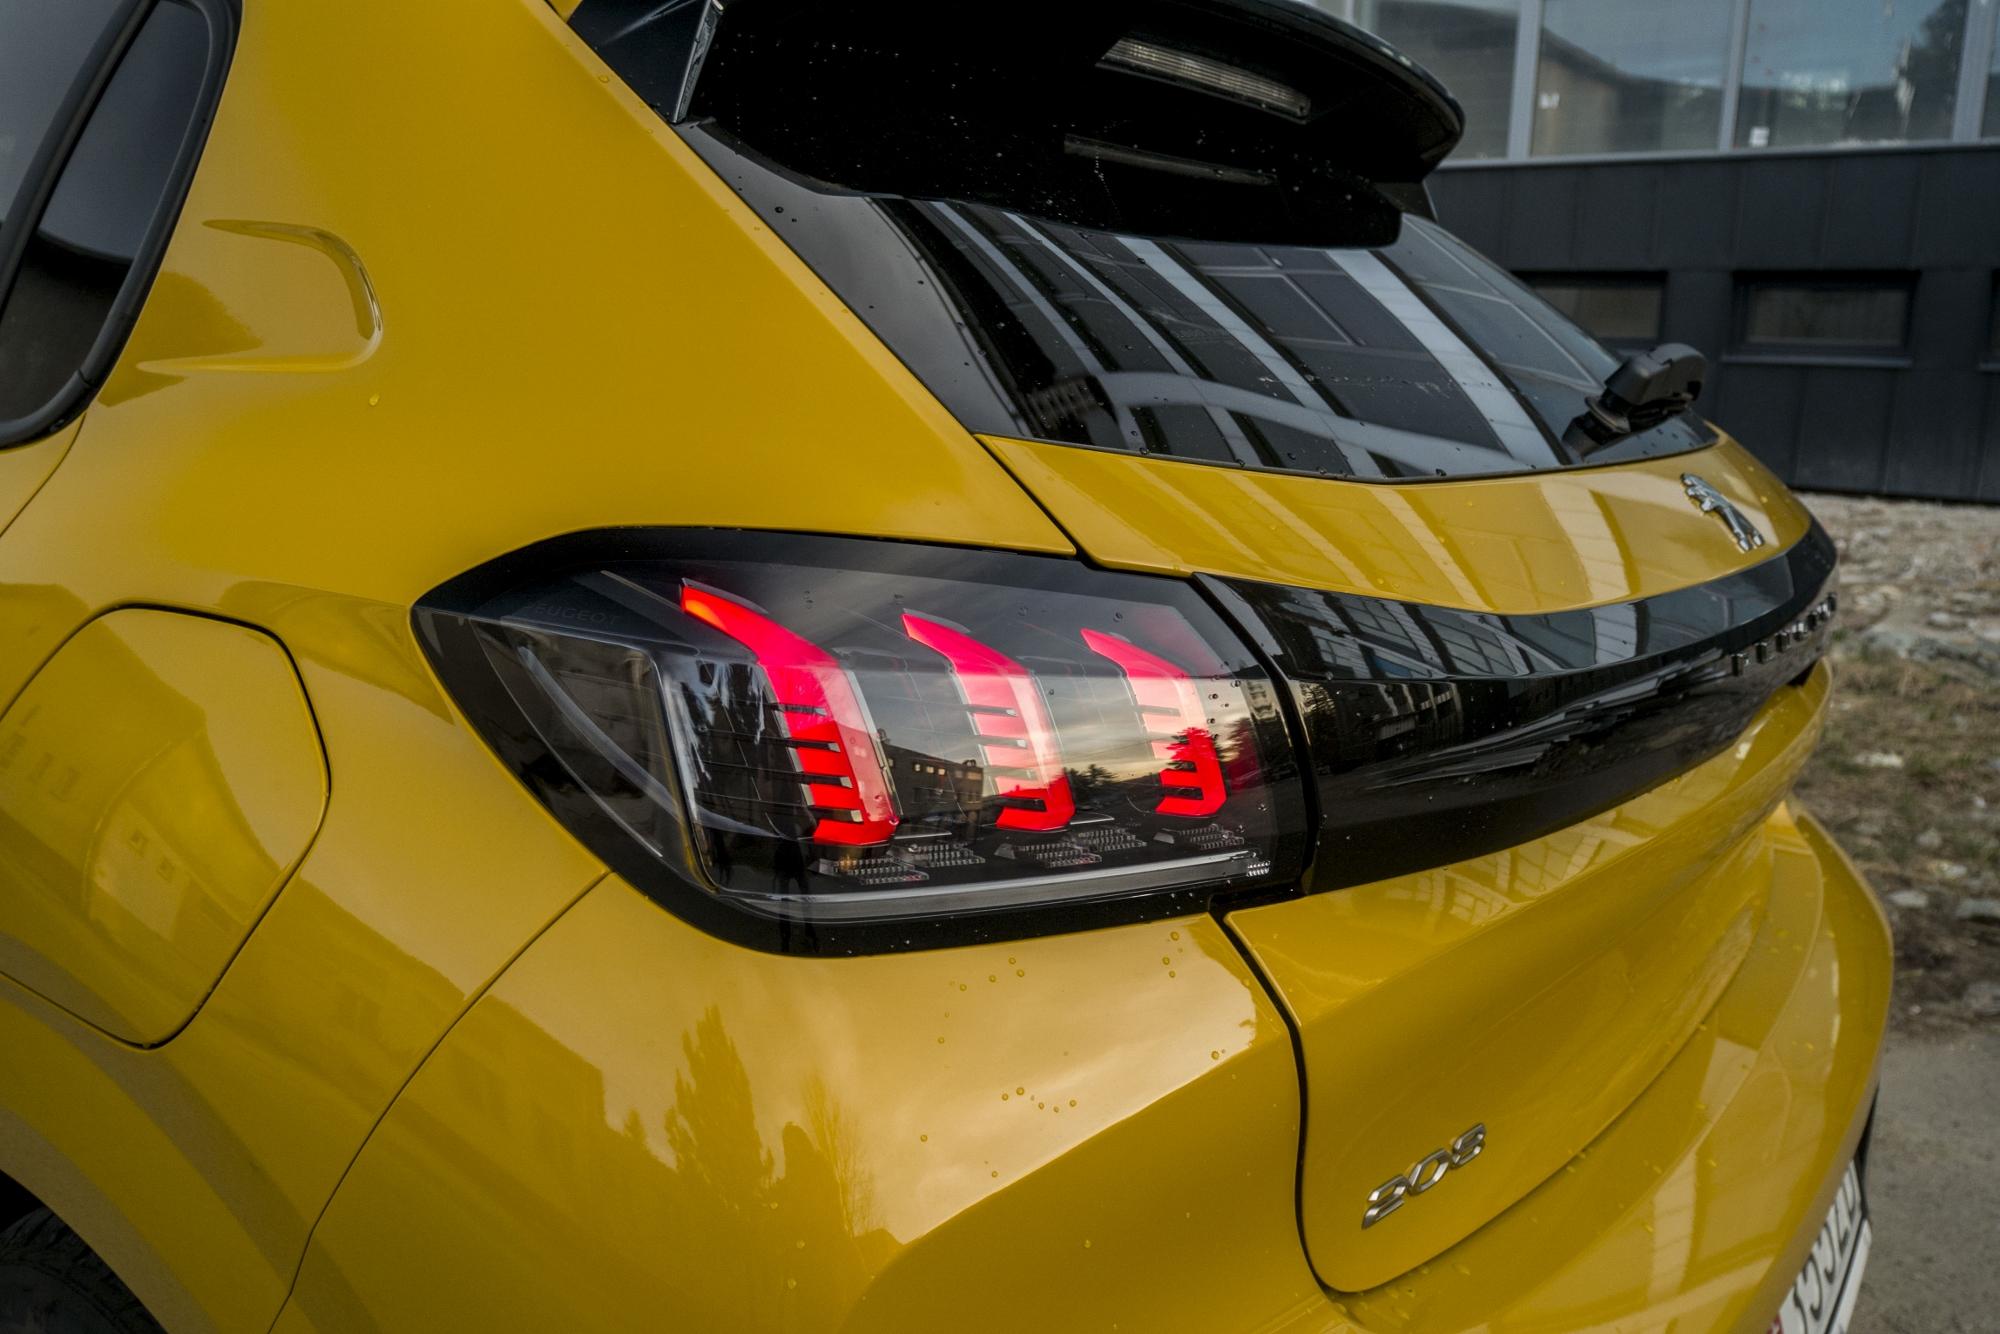 Test: Peugeot 208 prekvapivo pútal pohľady 4y9FgOpXG6 peugeot-208-25